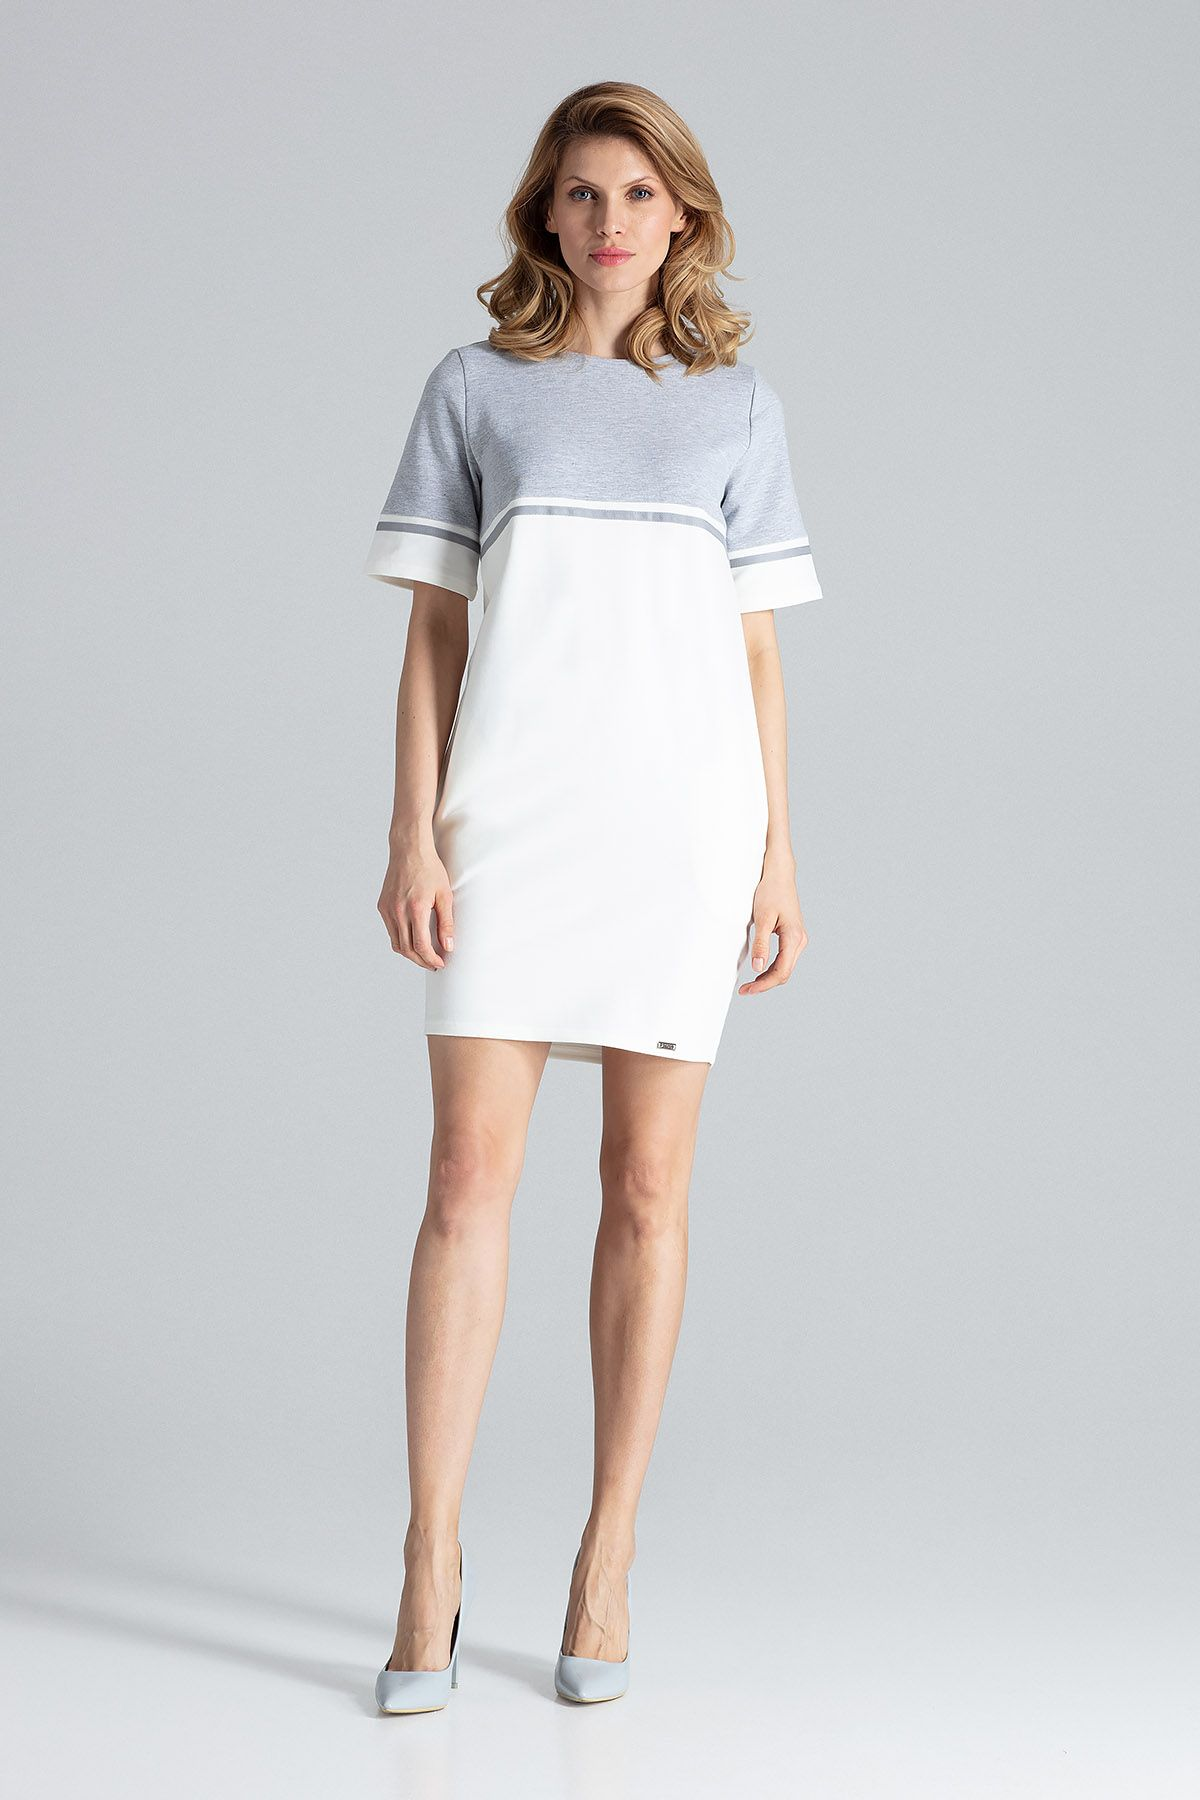 White Comfy Cotton Mini Dress